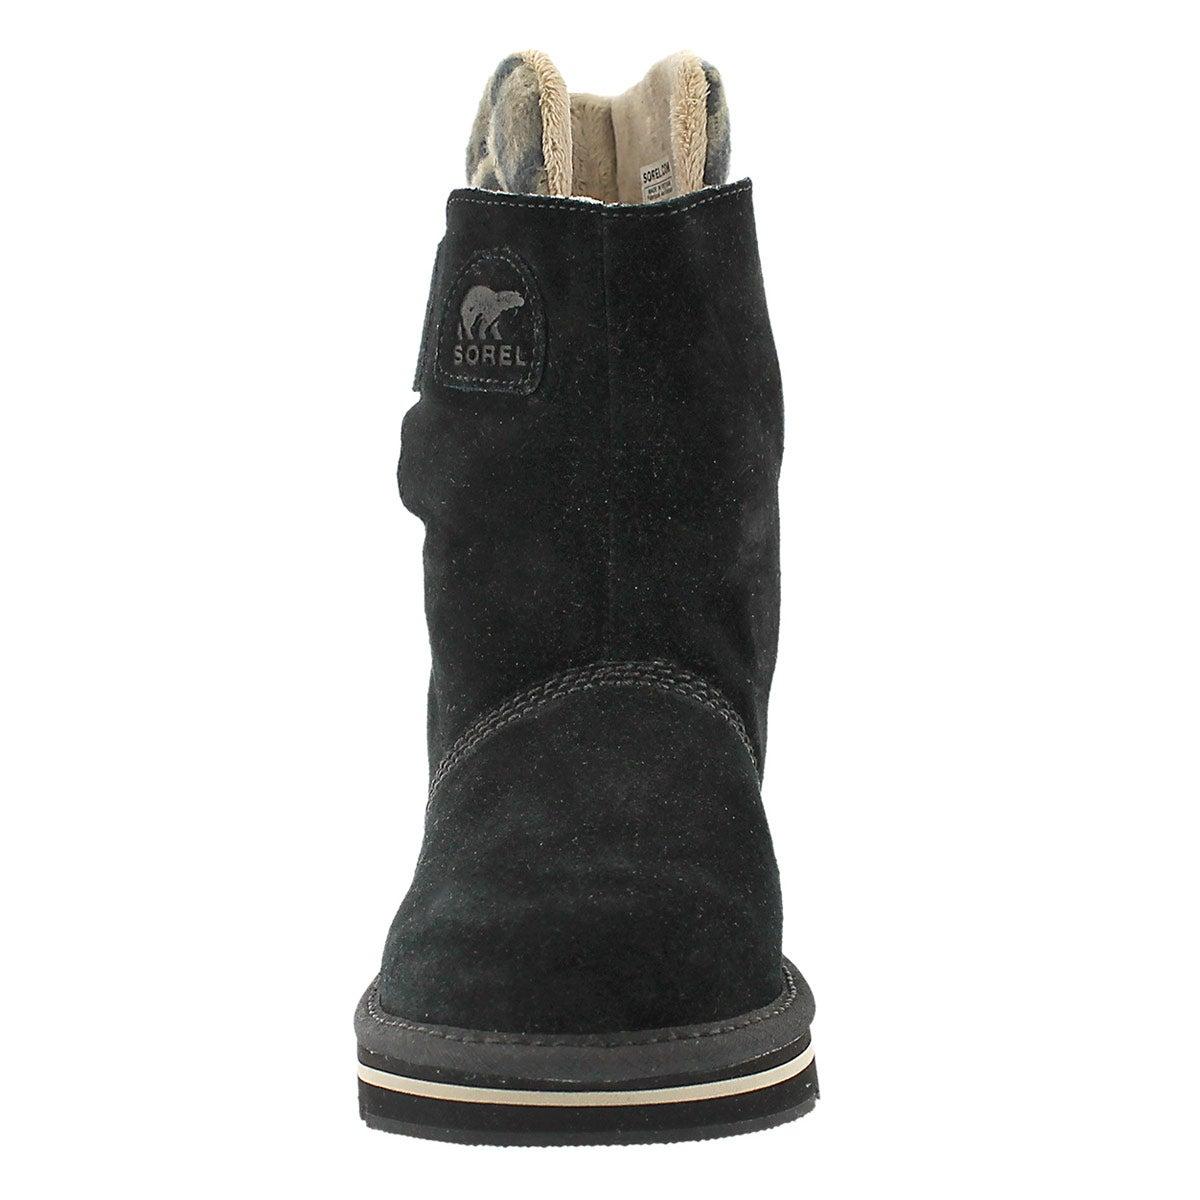 Lds The Newbie black bootie